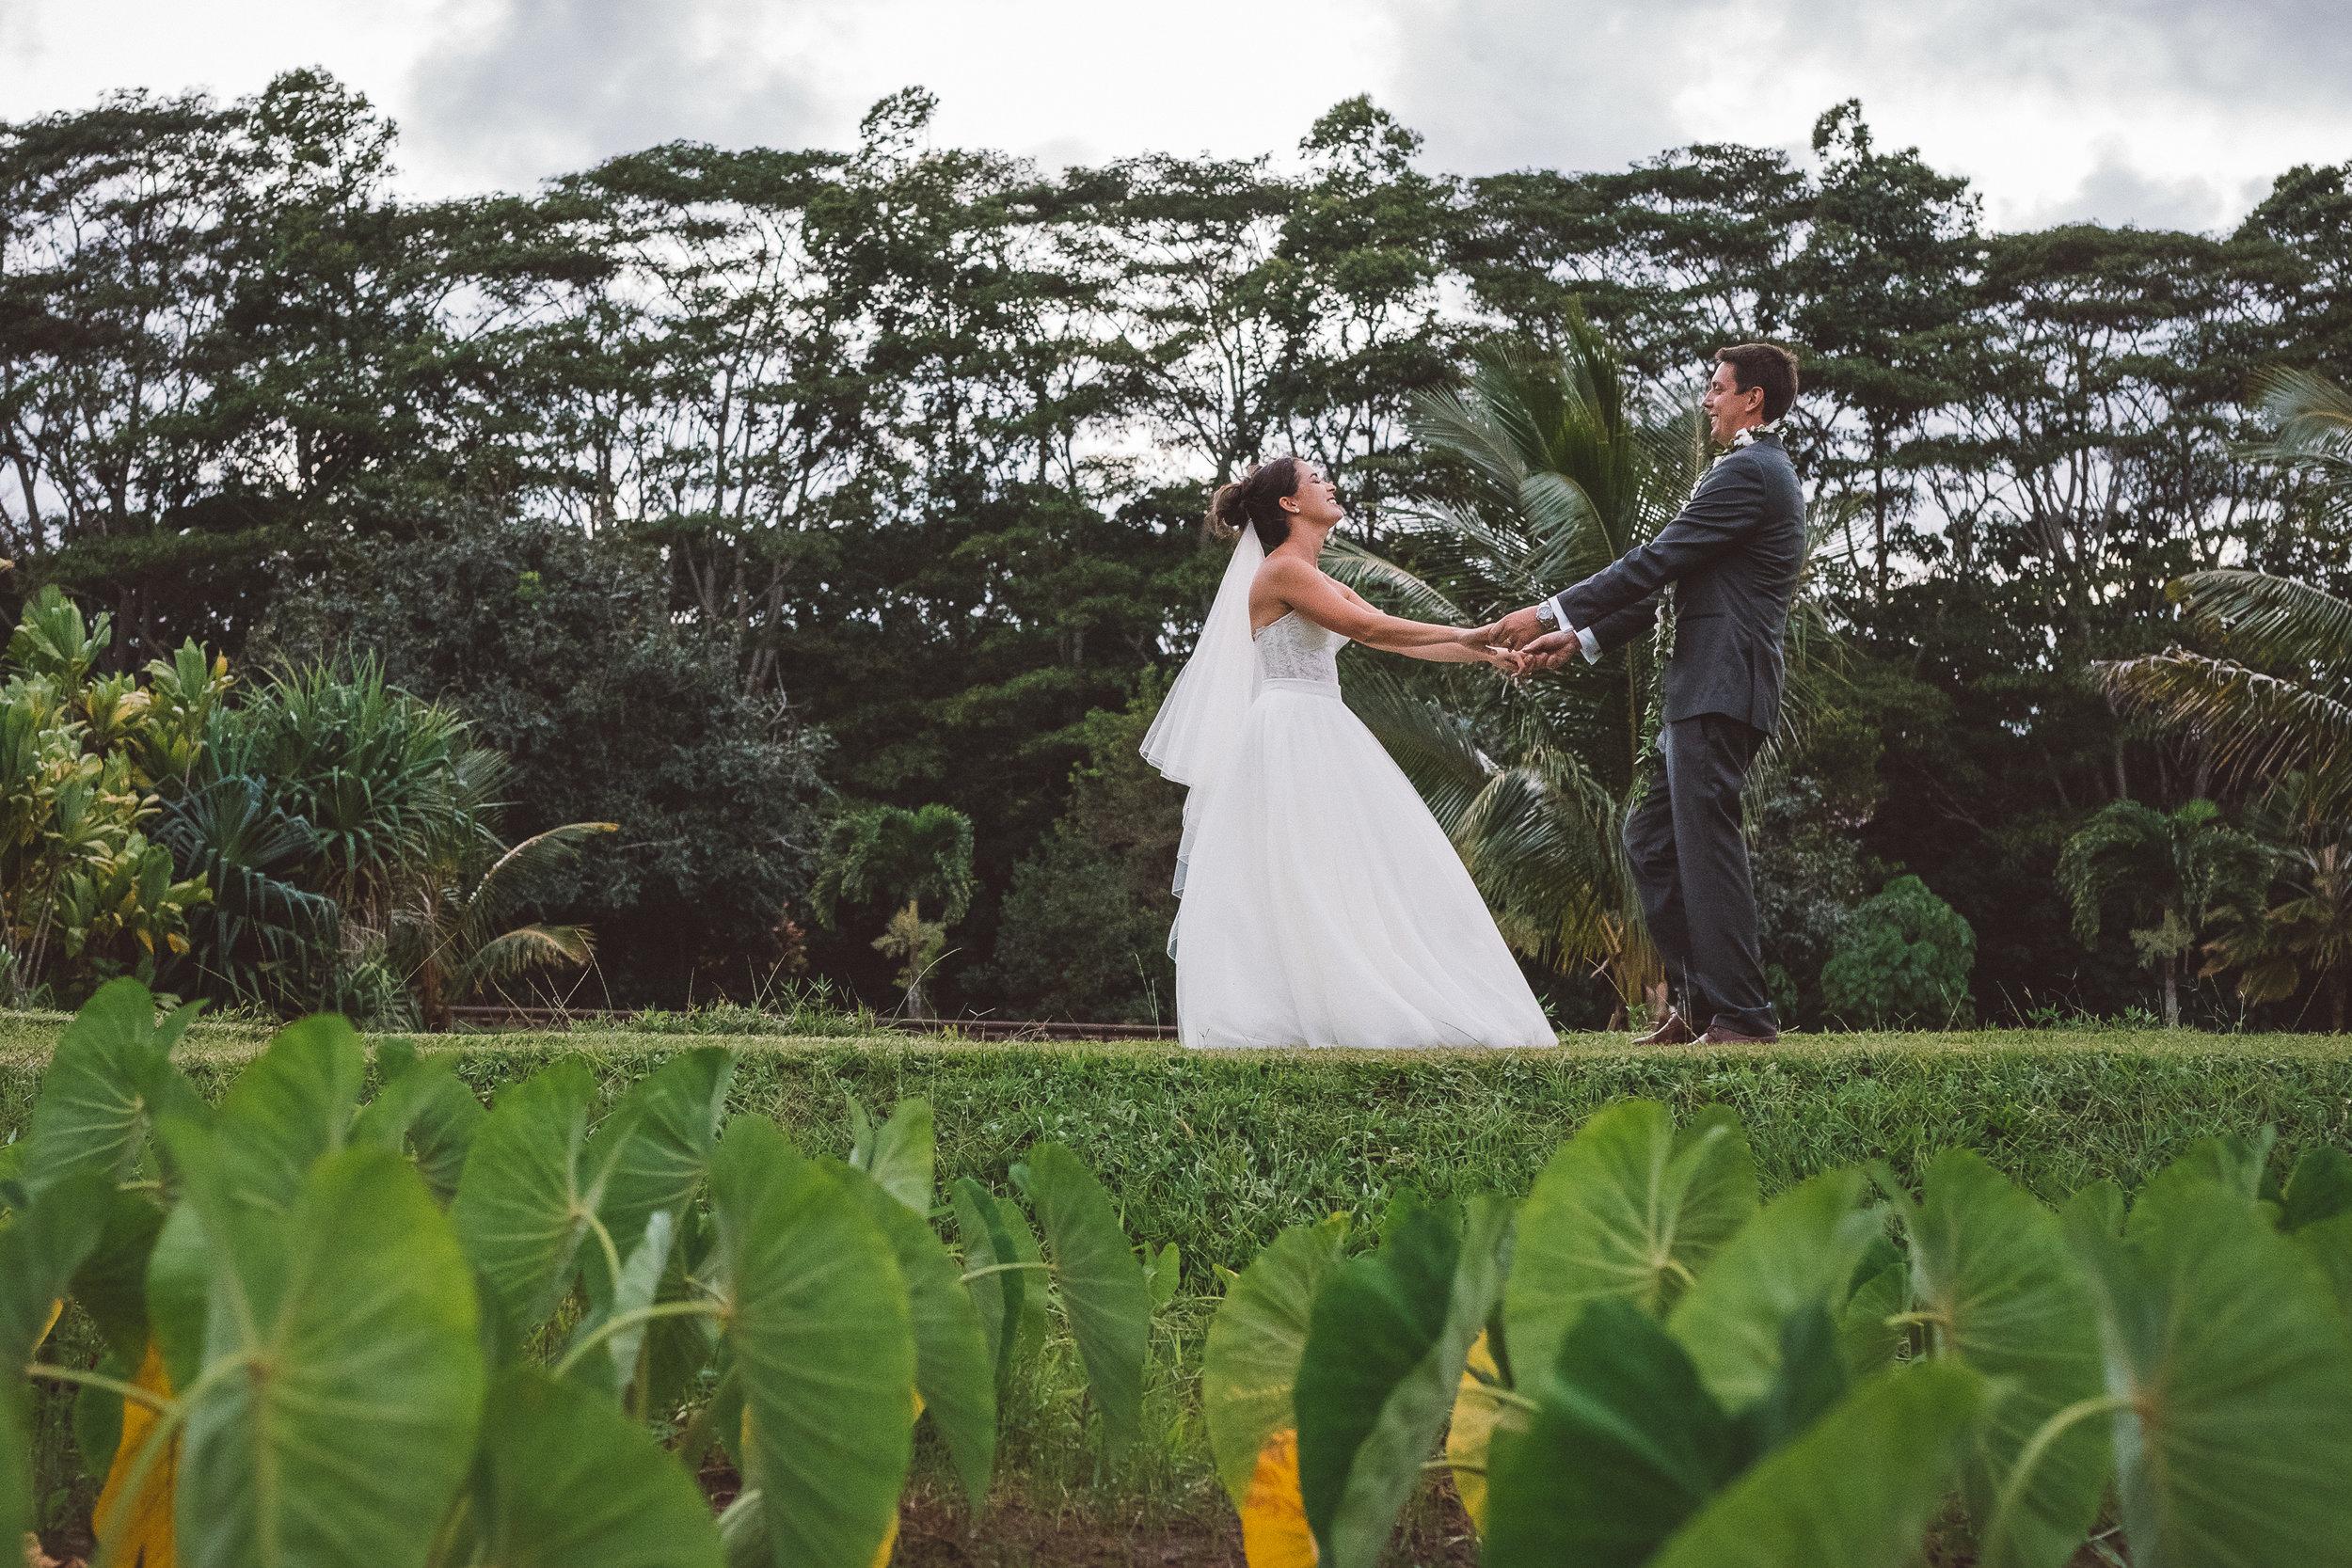 kauai wedding photograher couples family photograhy destination weddings loveblissimaging.com 006.jpg